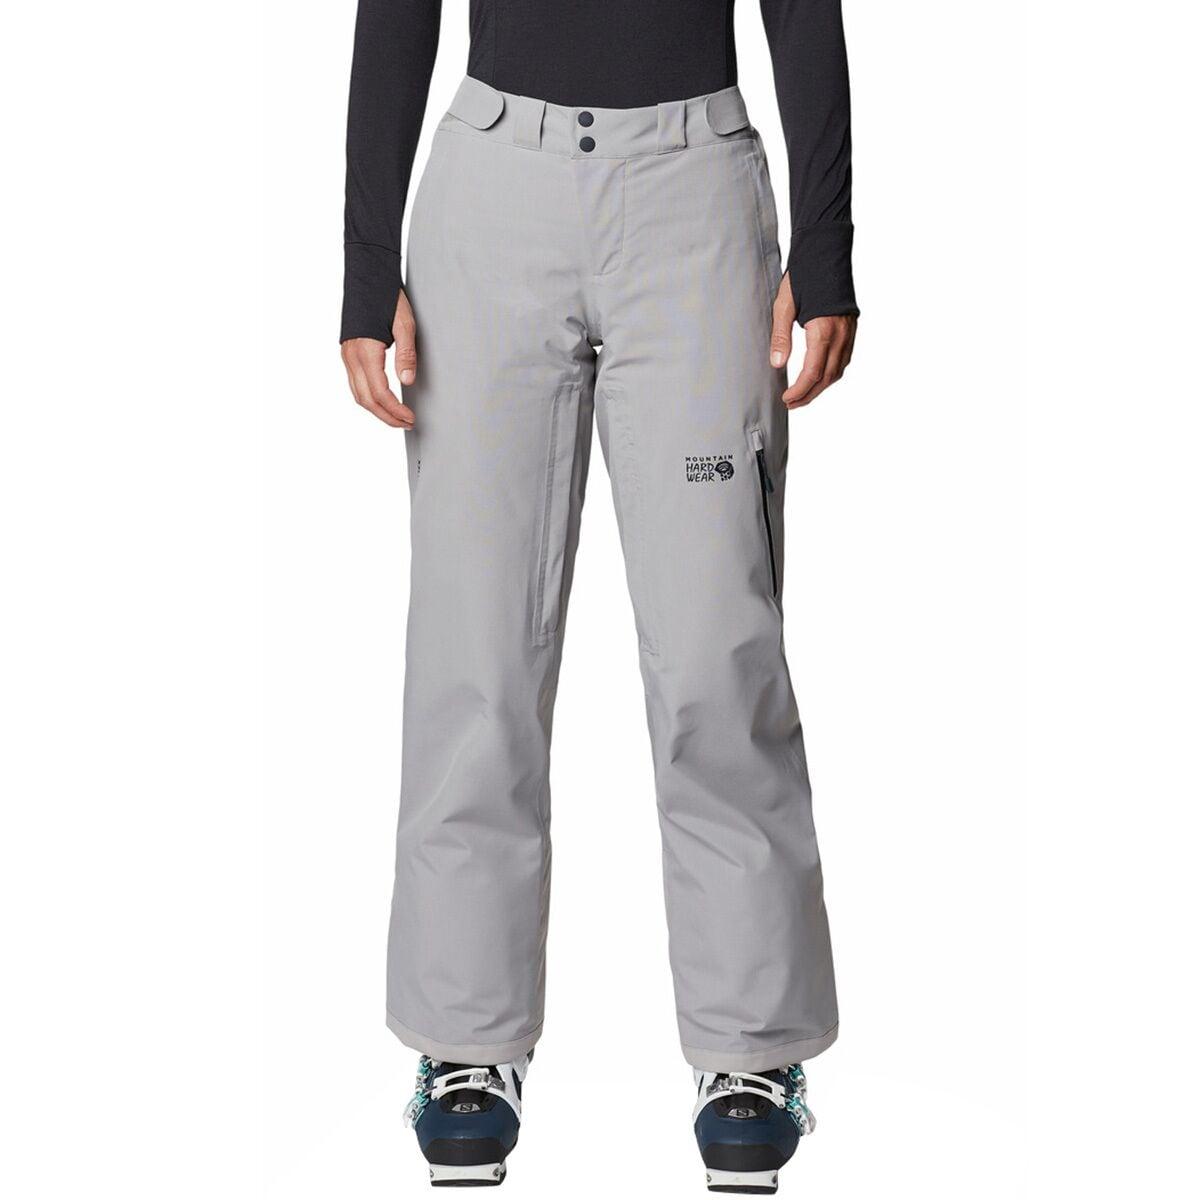 Cloud Bank GTX Insulated Pant - Women